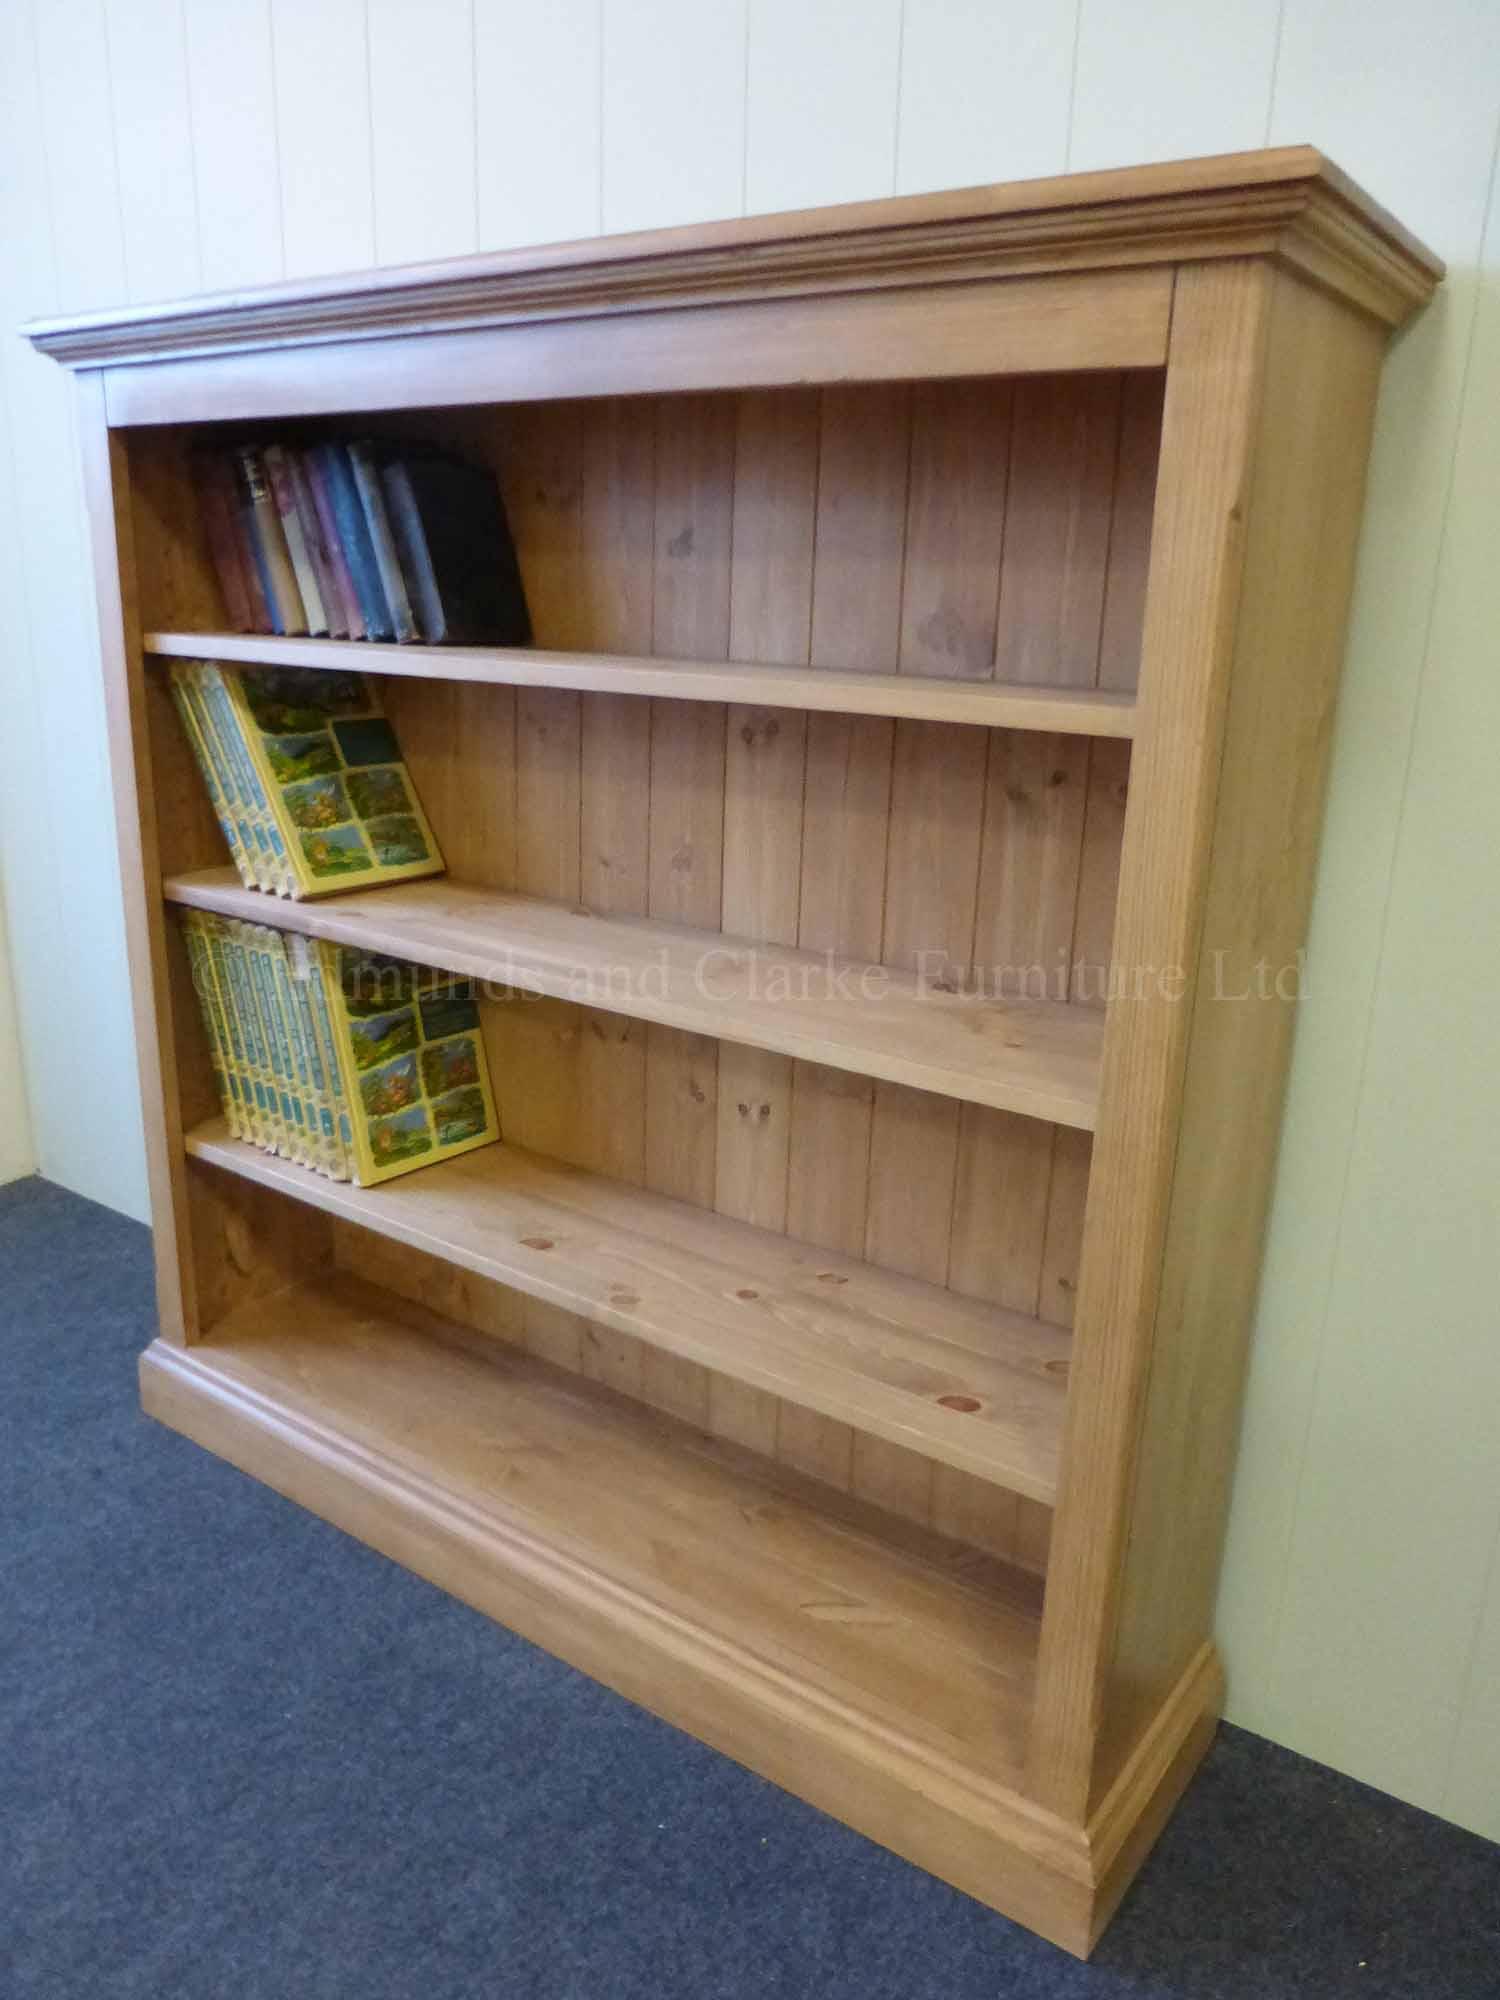 Edmunds standard depth pine waxed bookcase three adjustable shelves